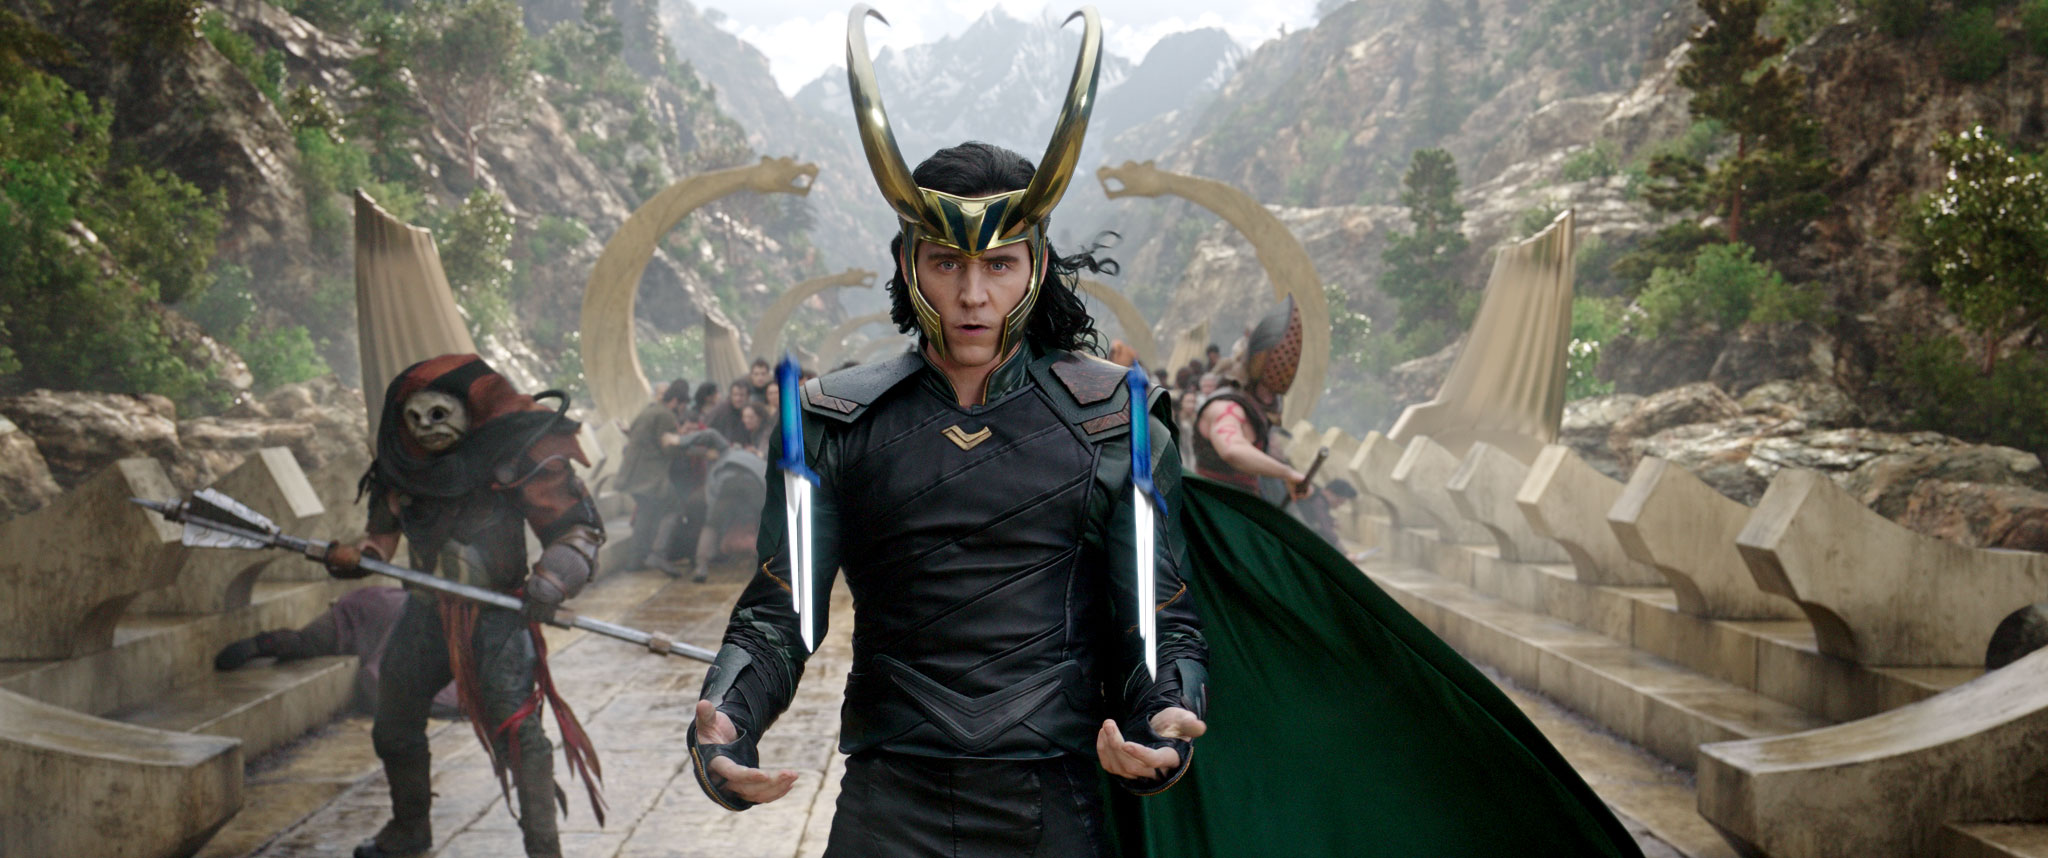 Marvel's Disney+ Super Bowl Ad Teased a Huge Reveal for the 'Loki' Series